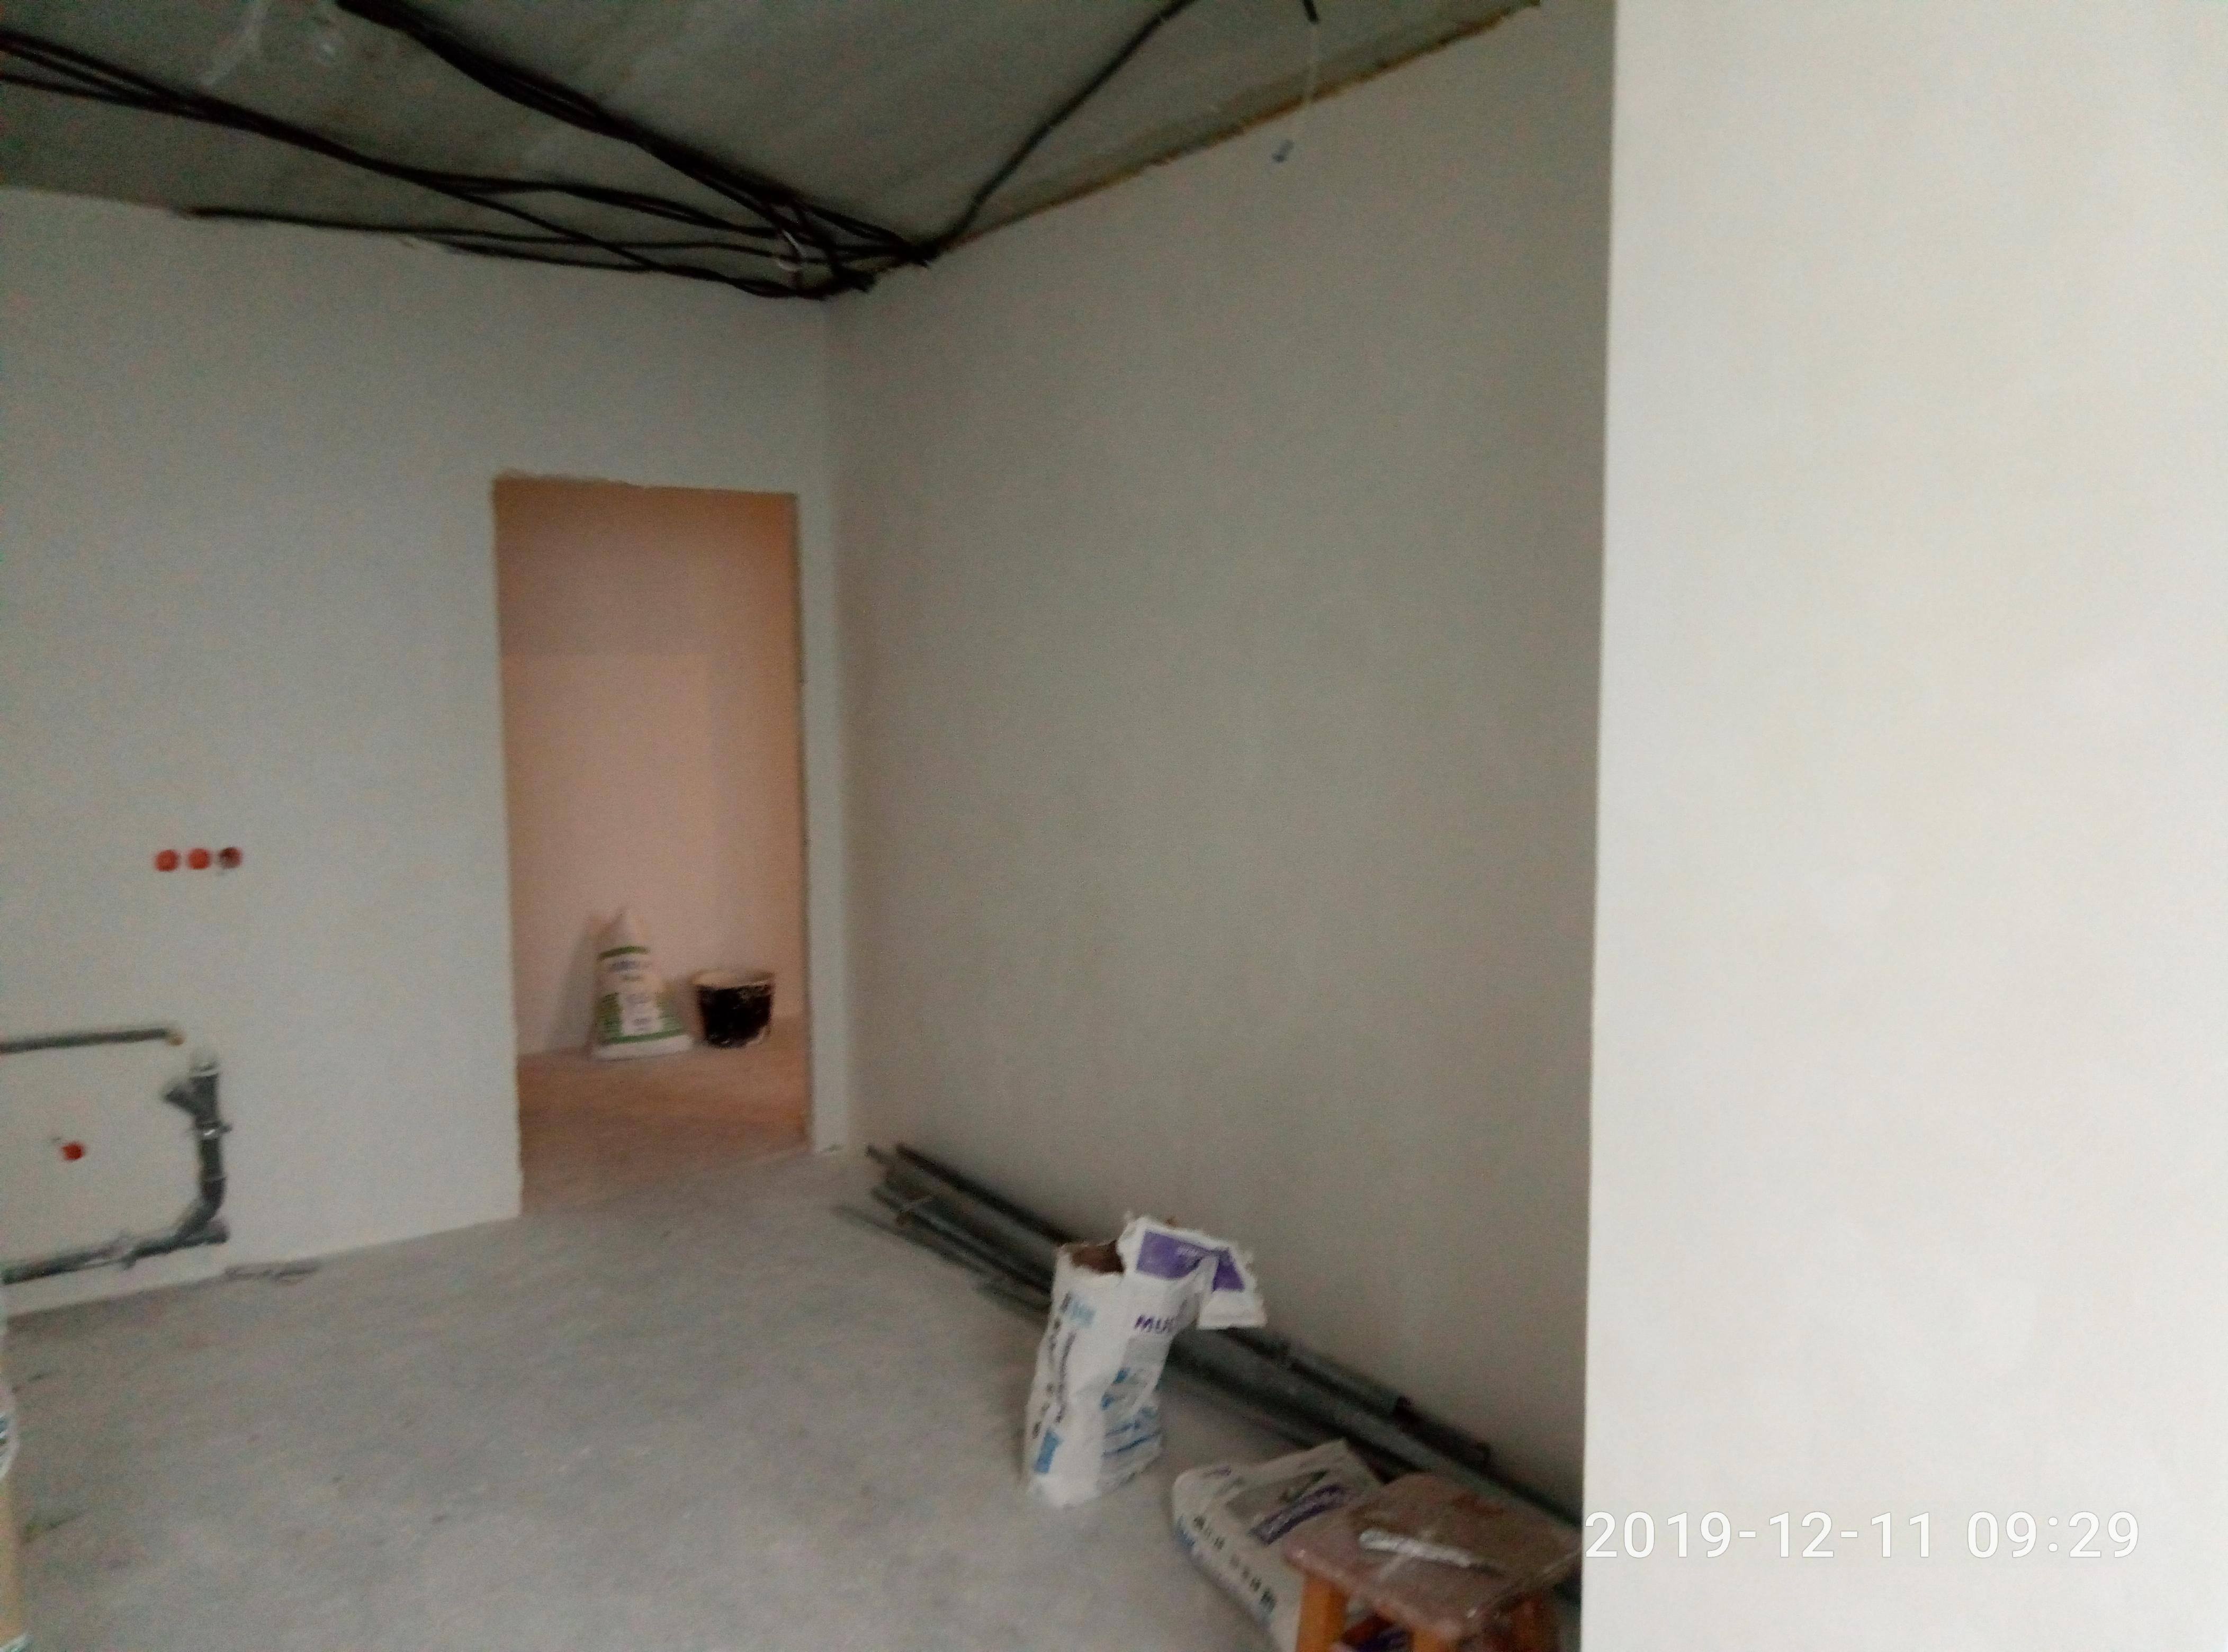 Фото Шпаклевка стен по стеклохолсту под покраску